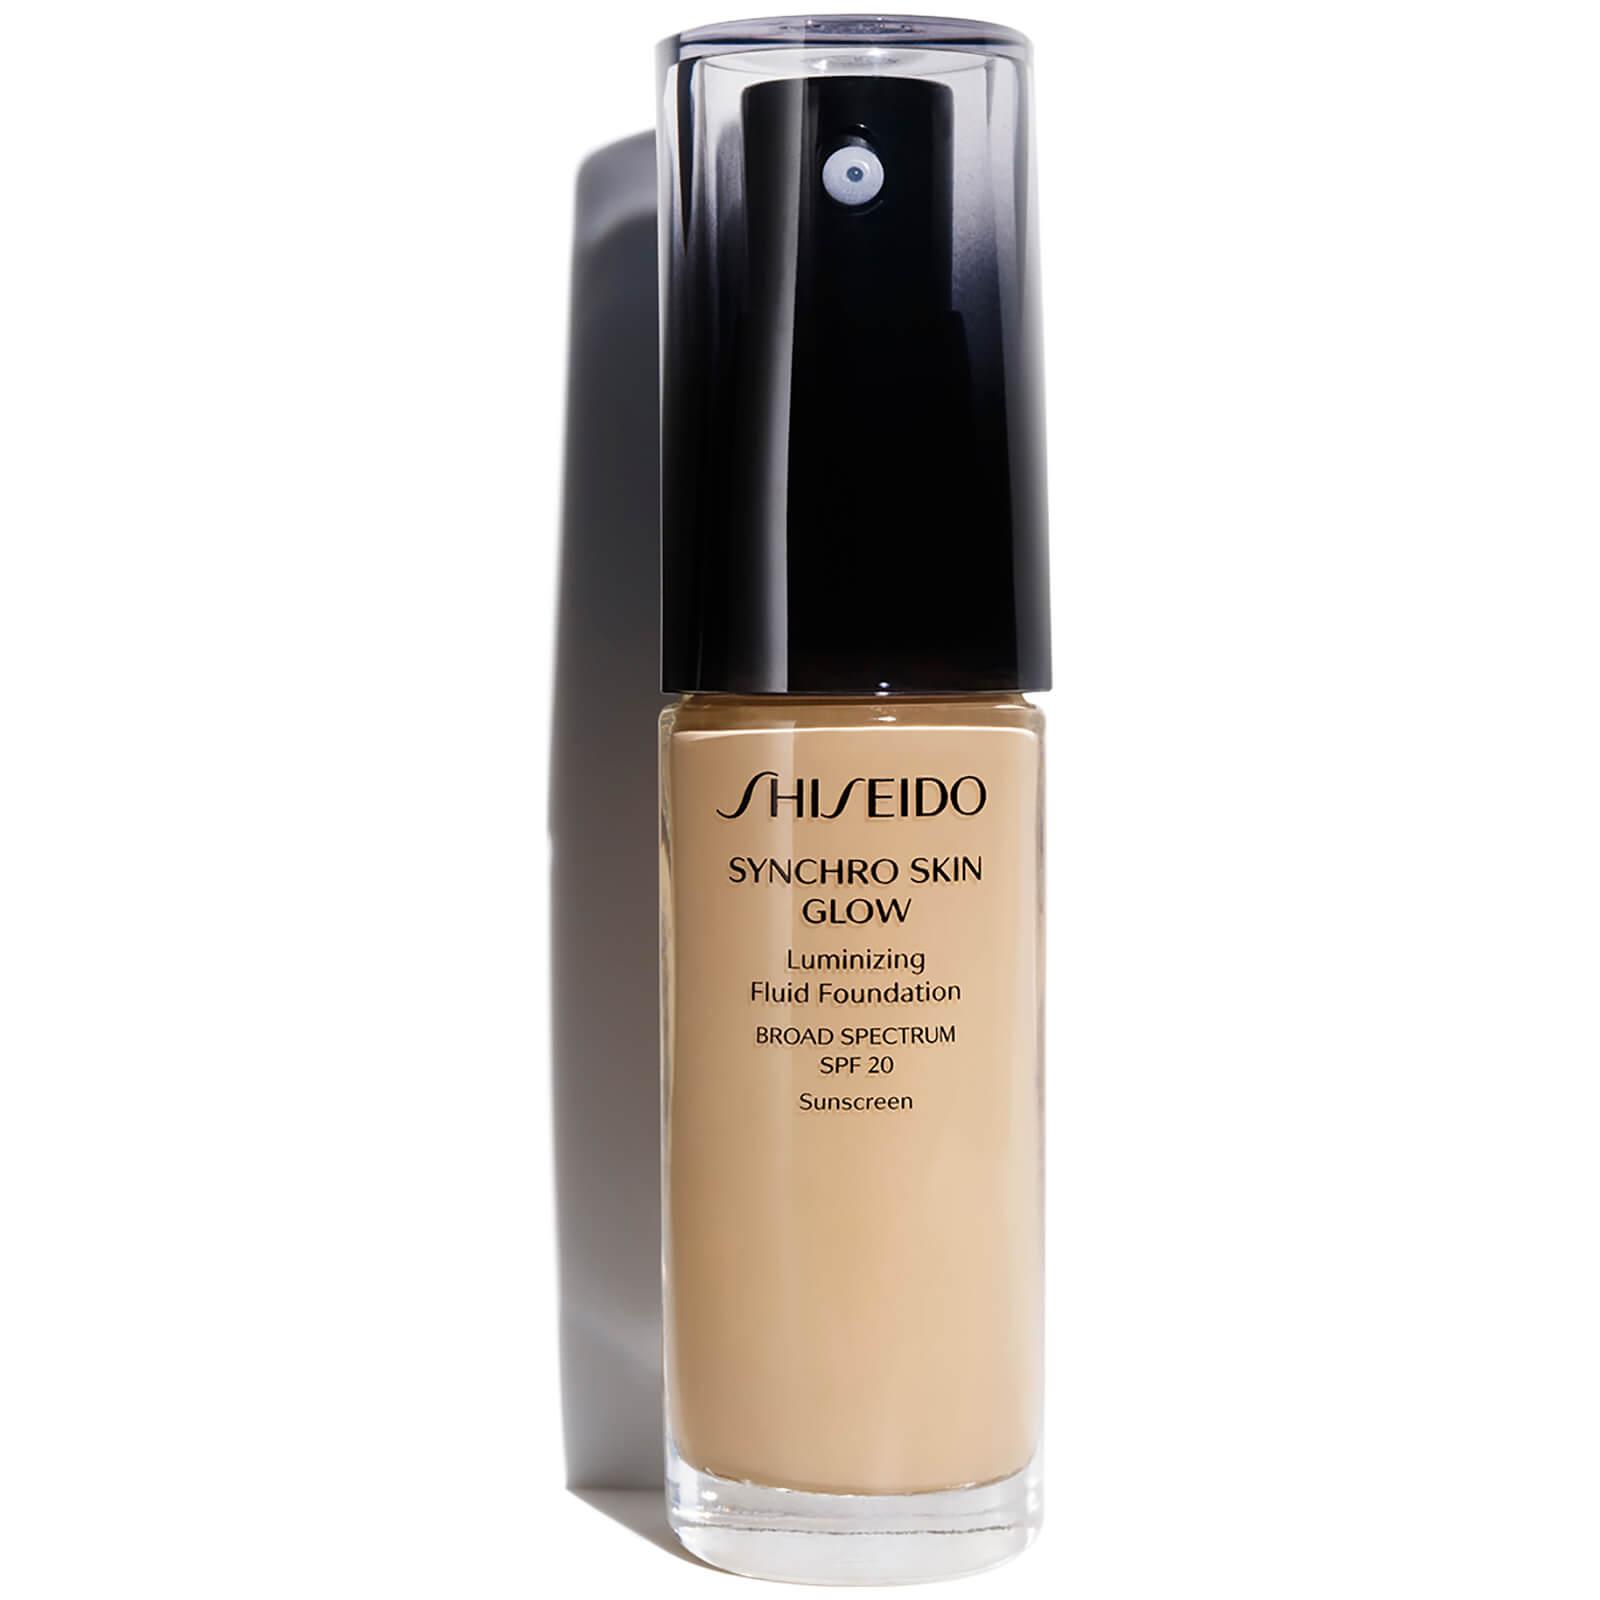 Shiseido Synchro Skin Glow Luminizing Foundation 30 ml (varie tonalità) - Golden 4